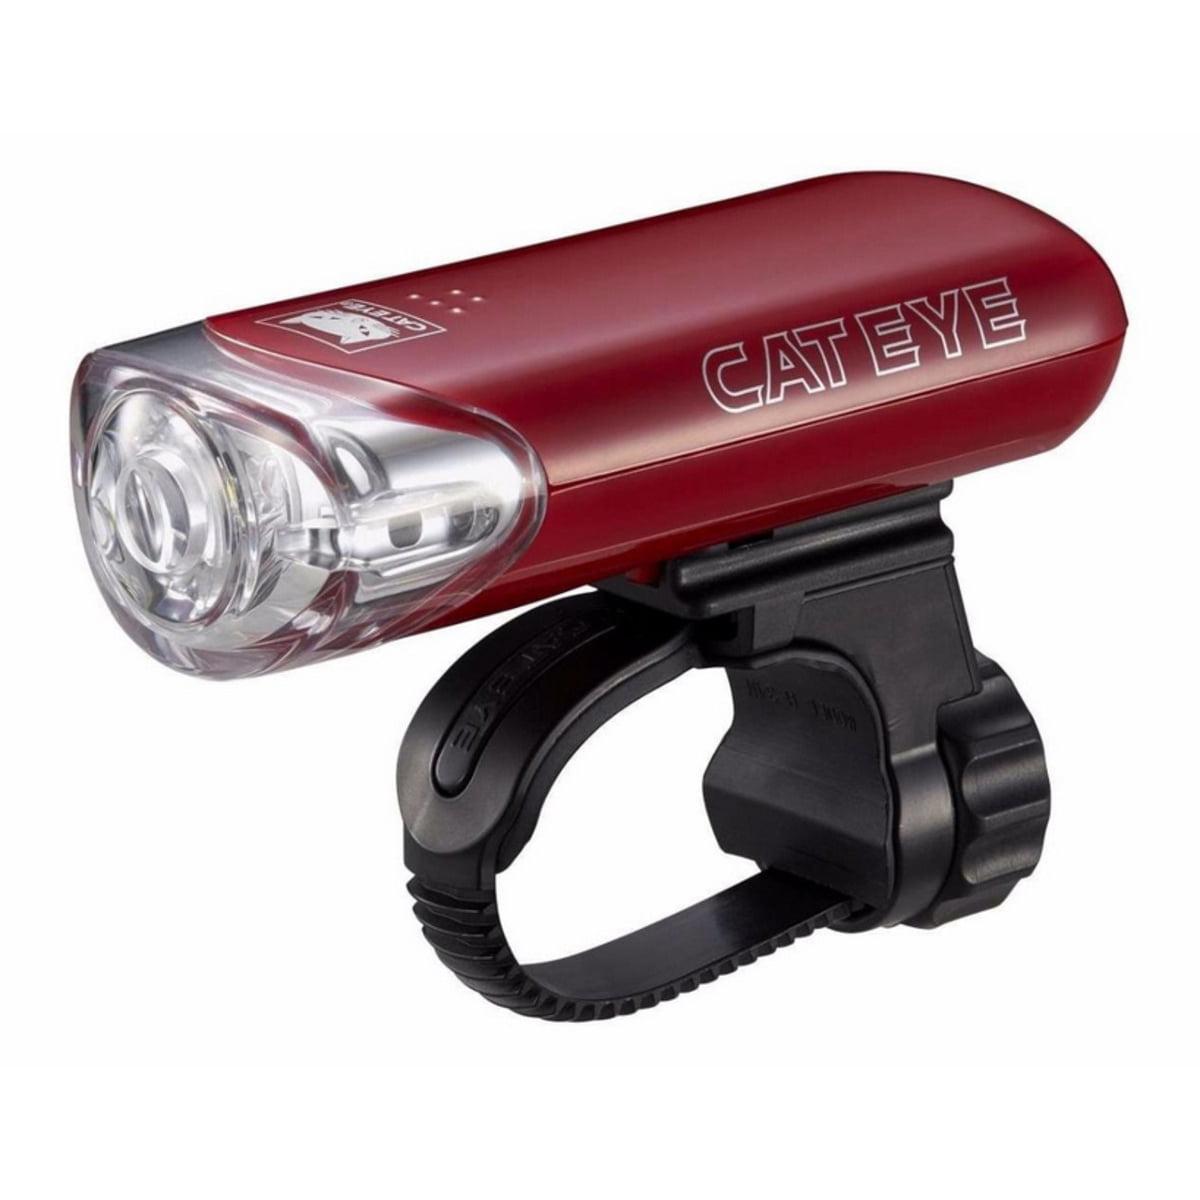 Cateye HL-EL140 Headlight